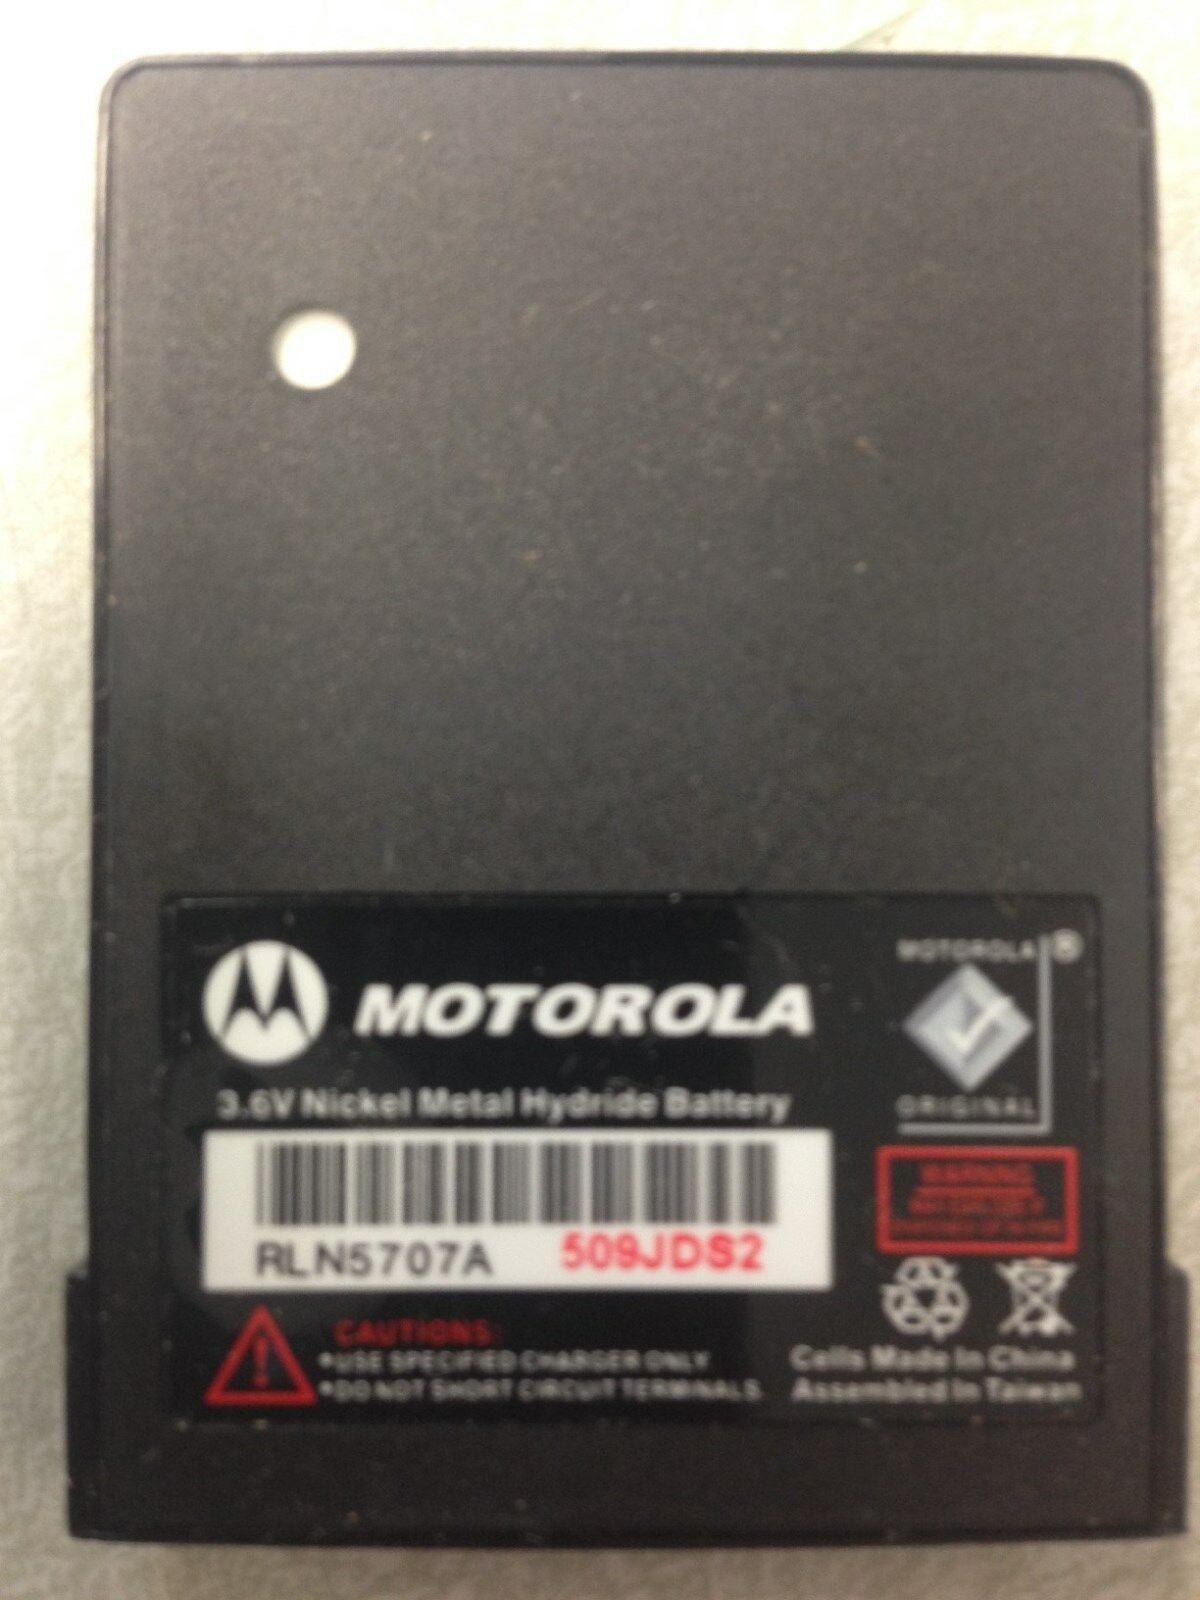 Newoem Motorola Minitor V 5 Pager Battery RLN5707 RLN5707...